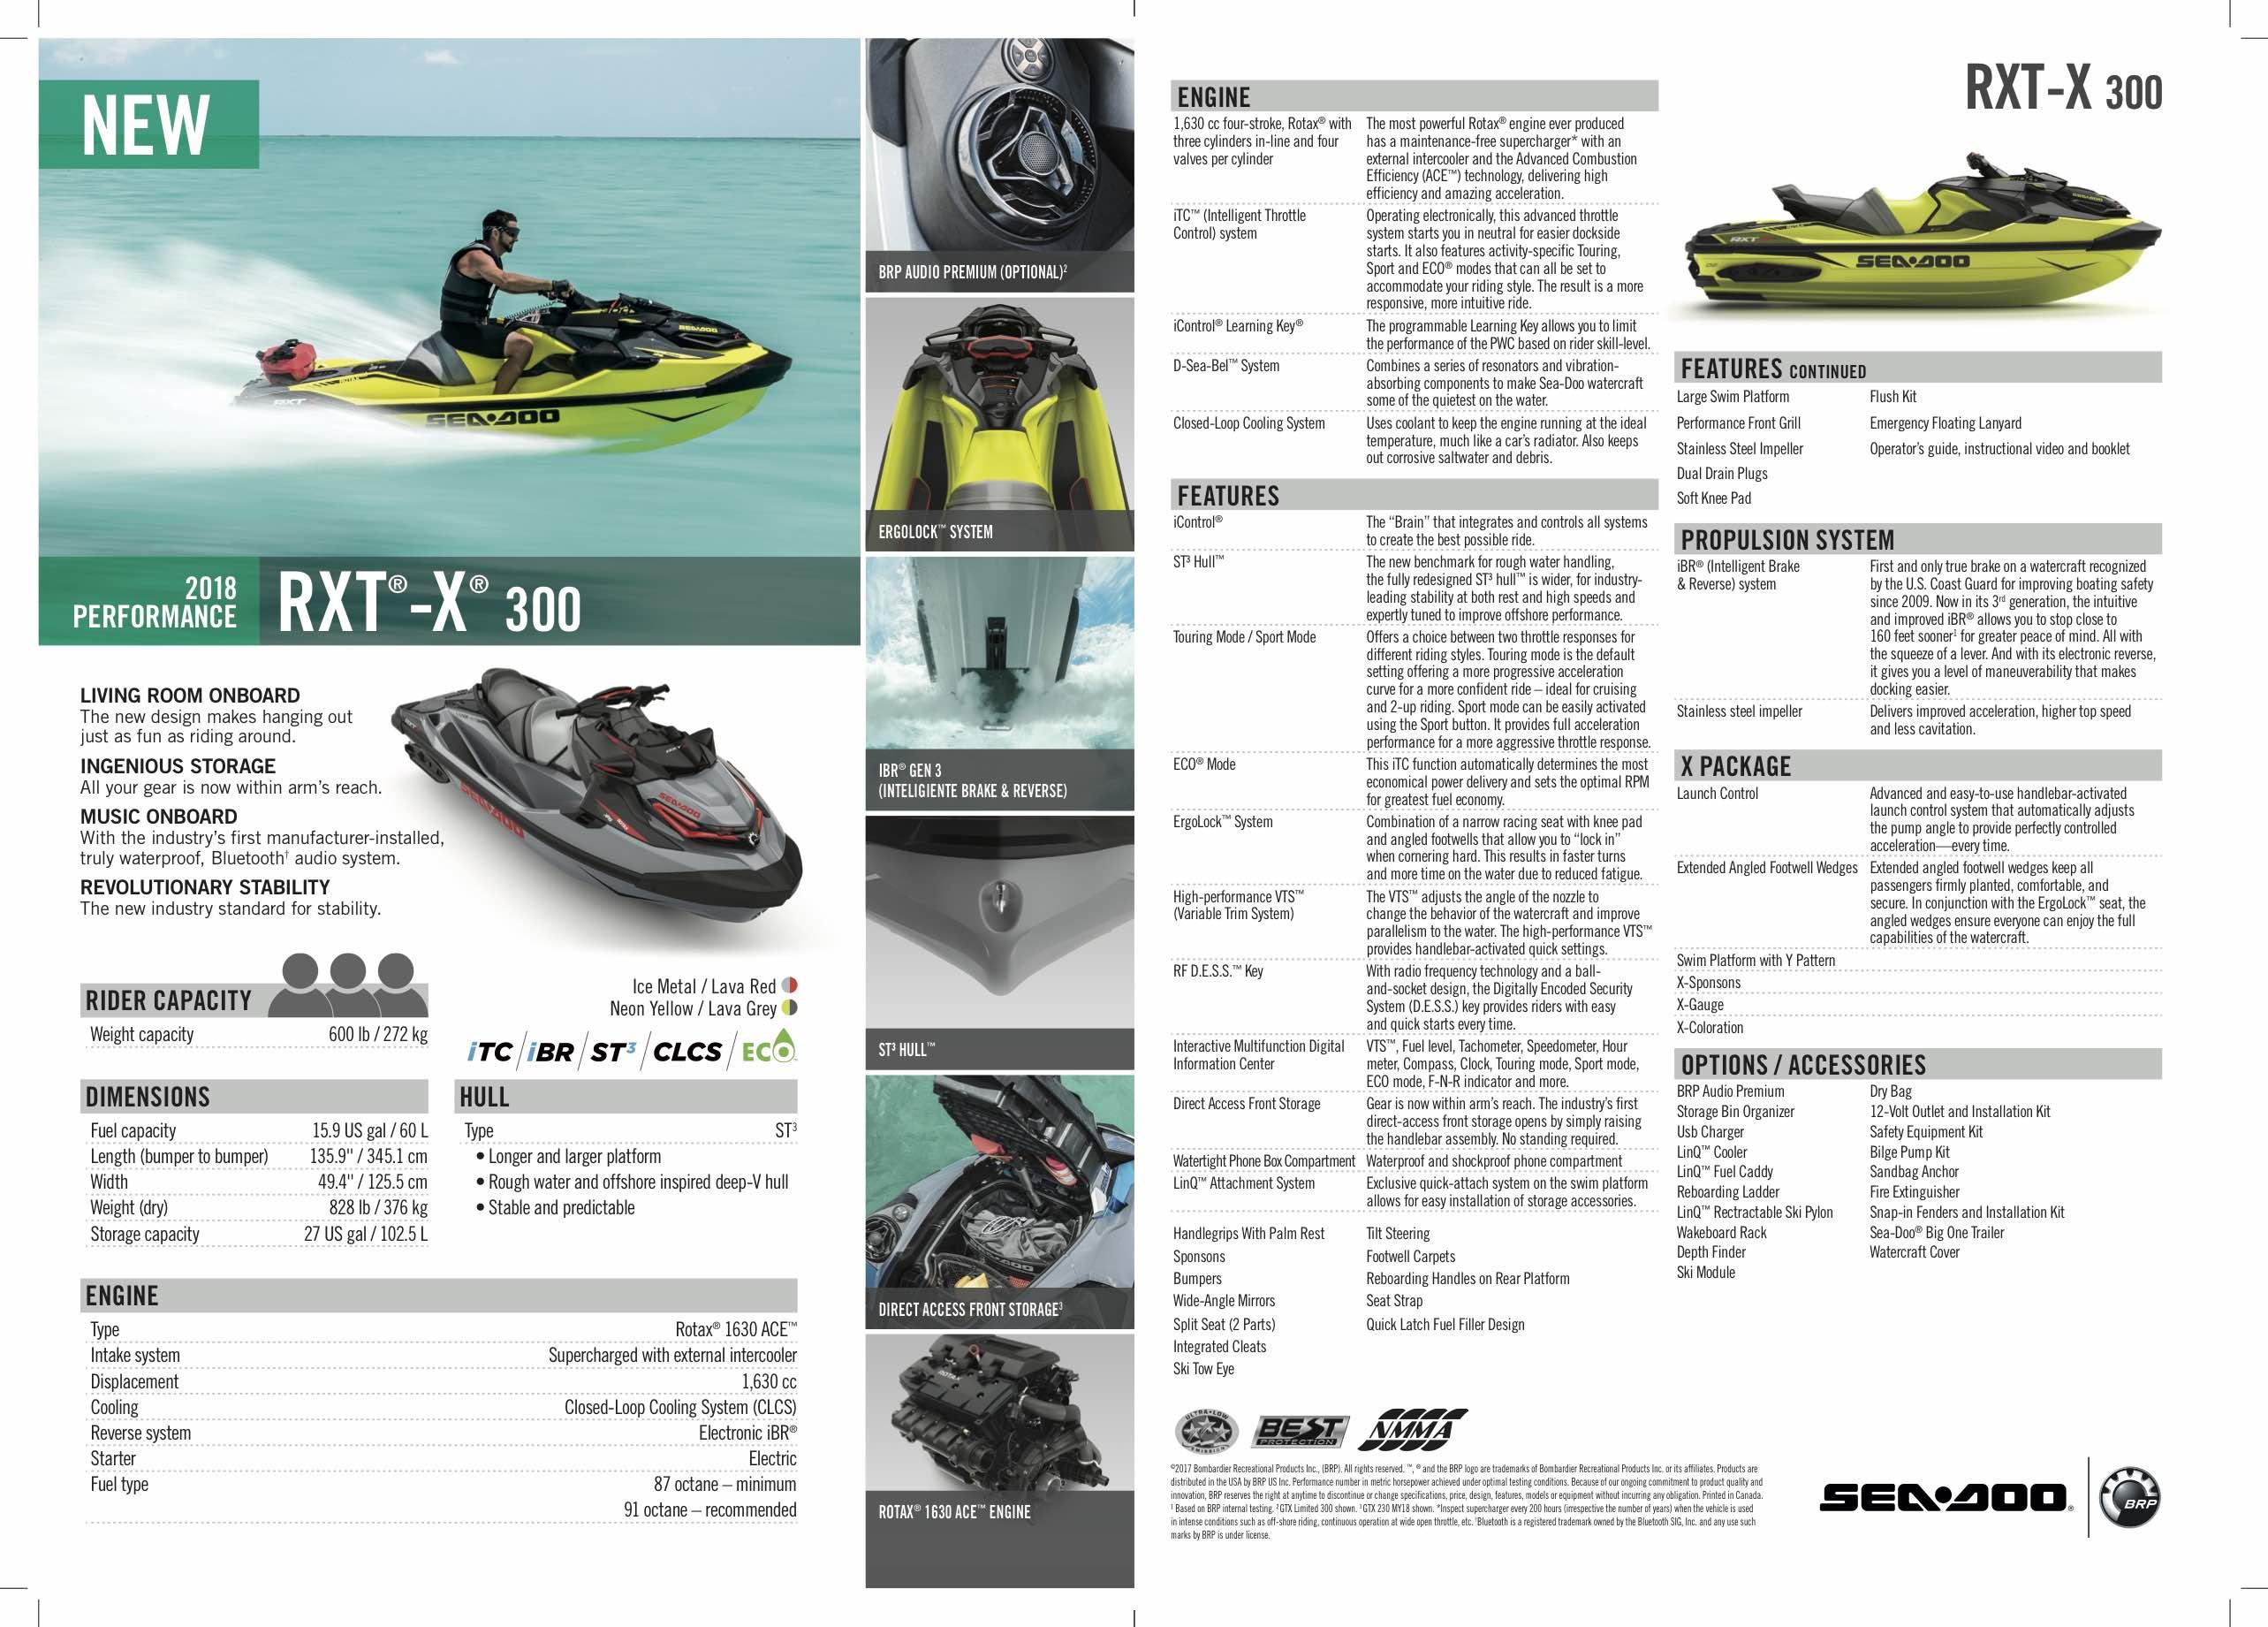 RXT-X 300 Seadoo Jet Ski available in Mallorca with Nauti Parts